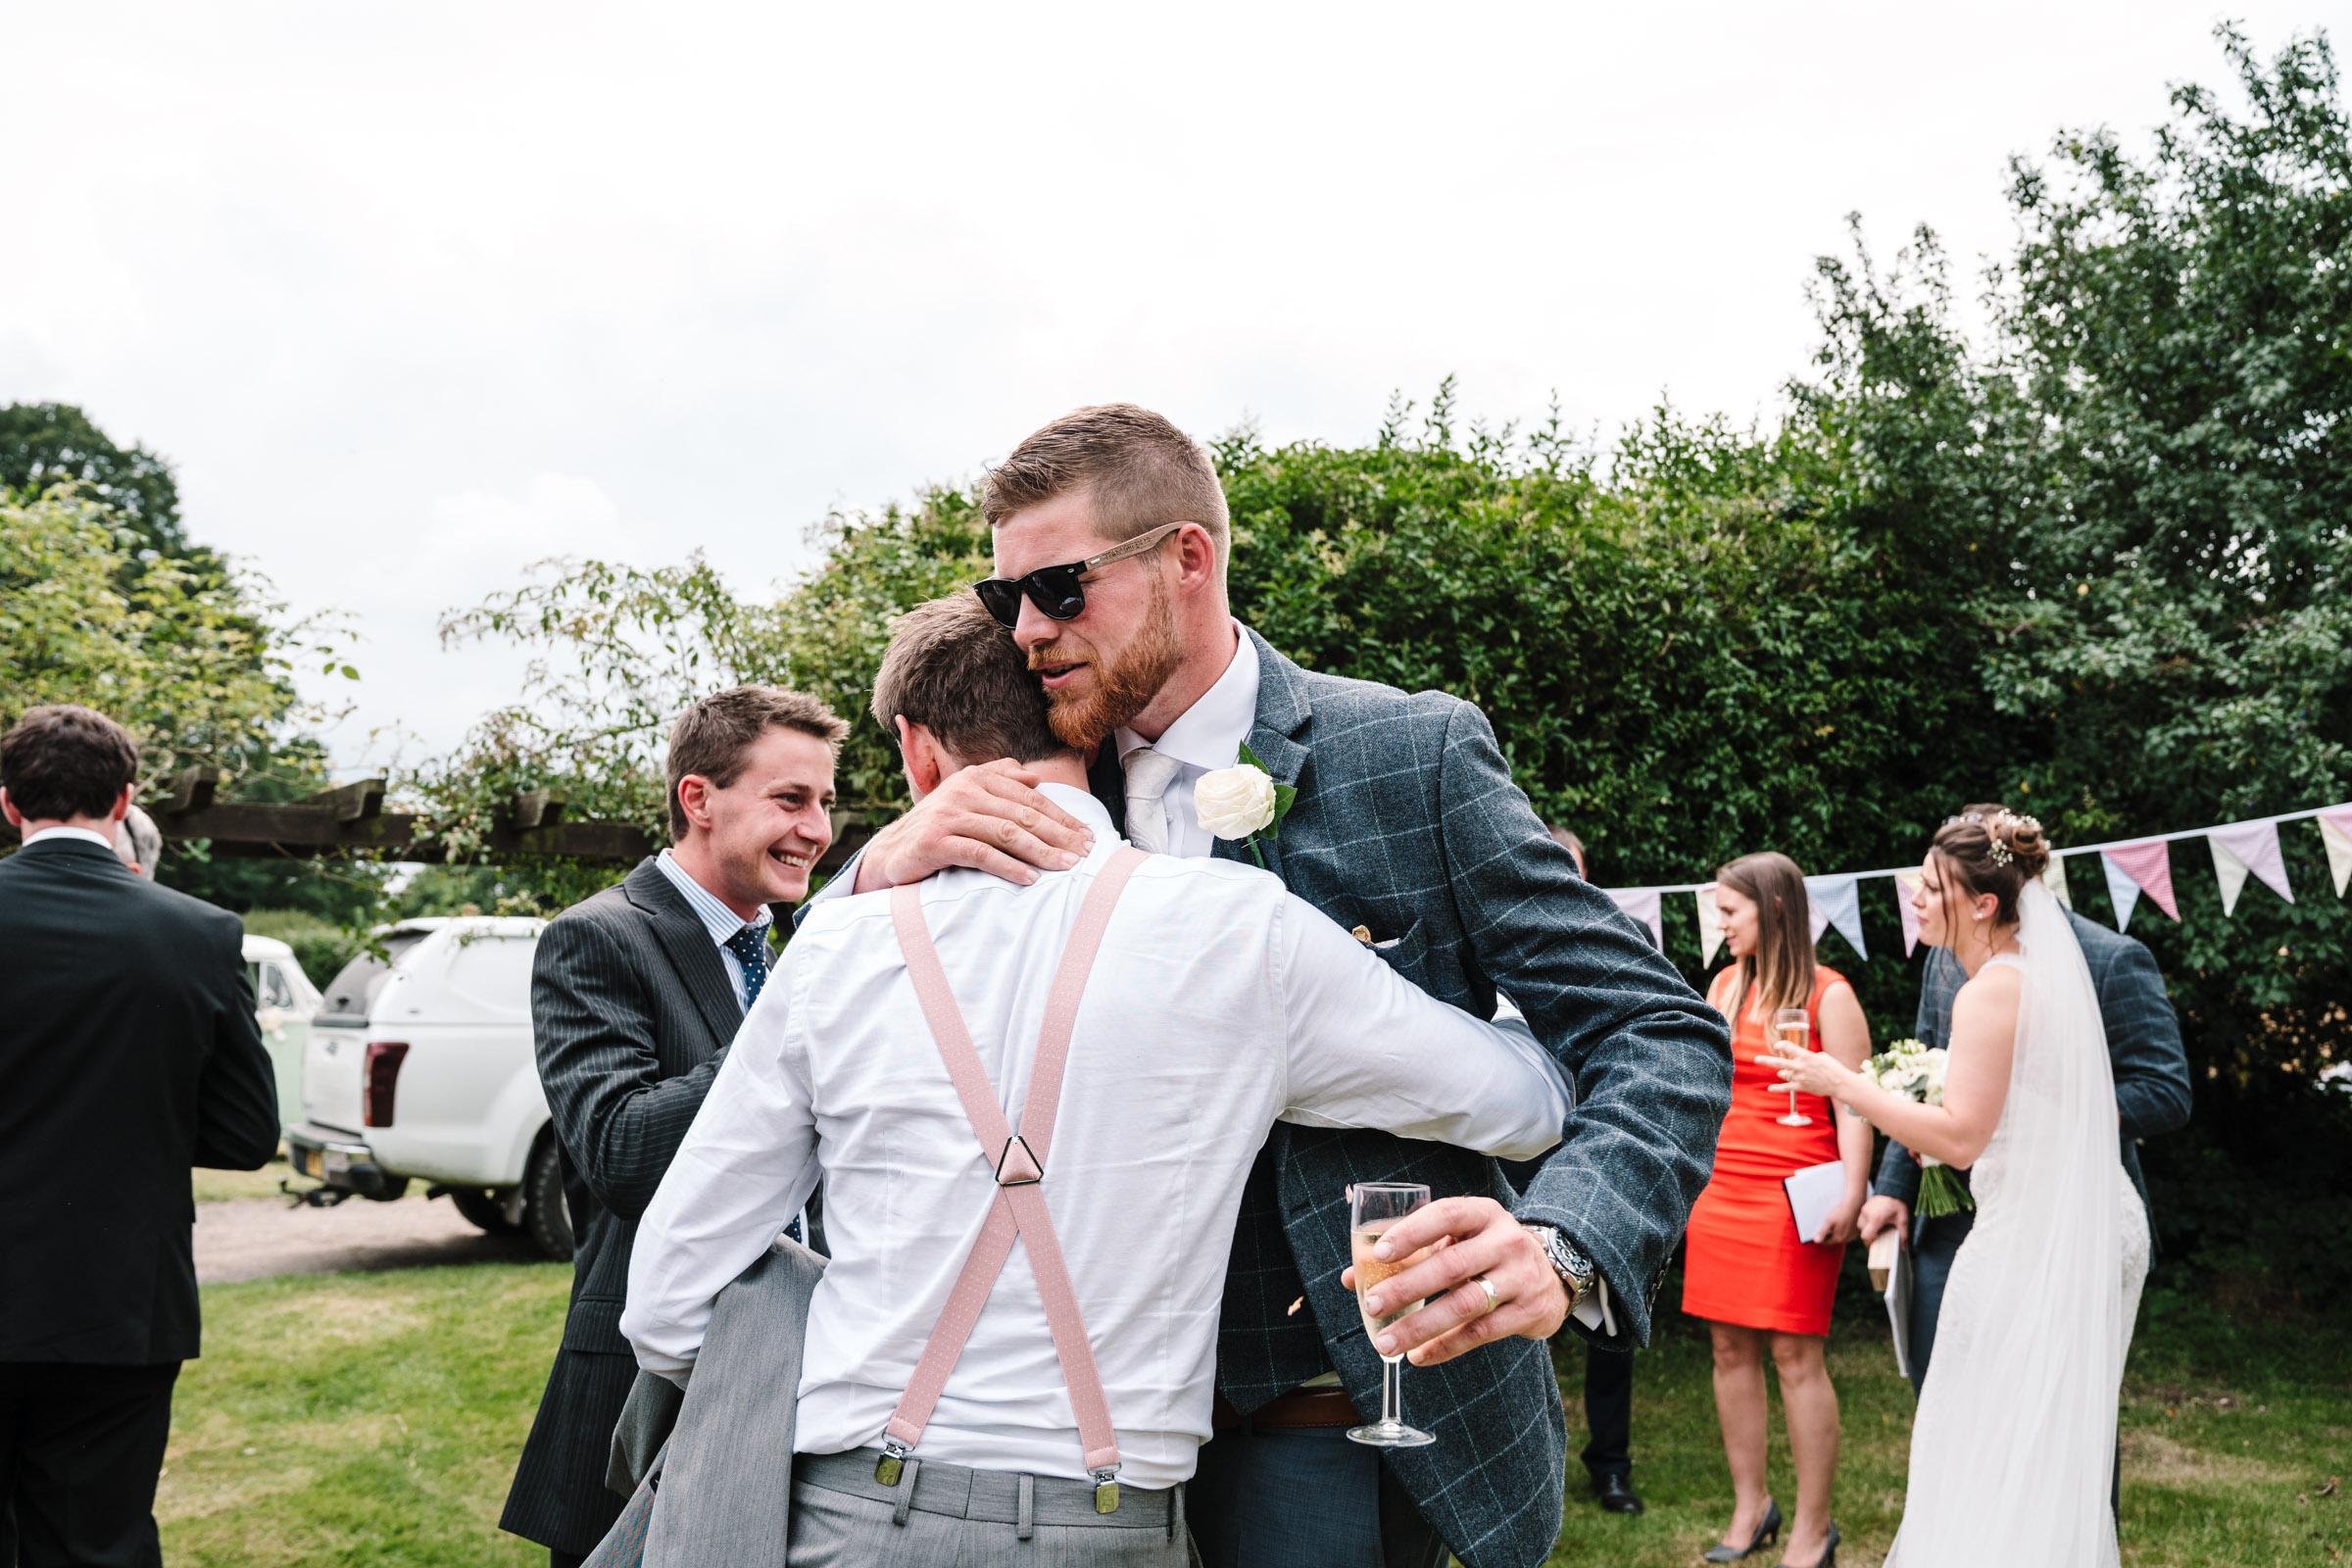 groom hugging friend during wedding reception